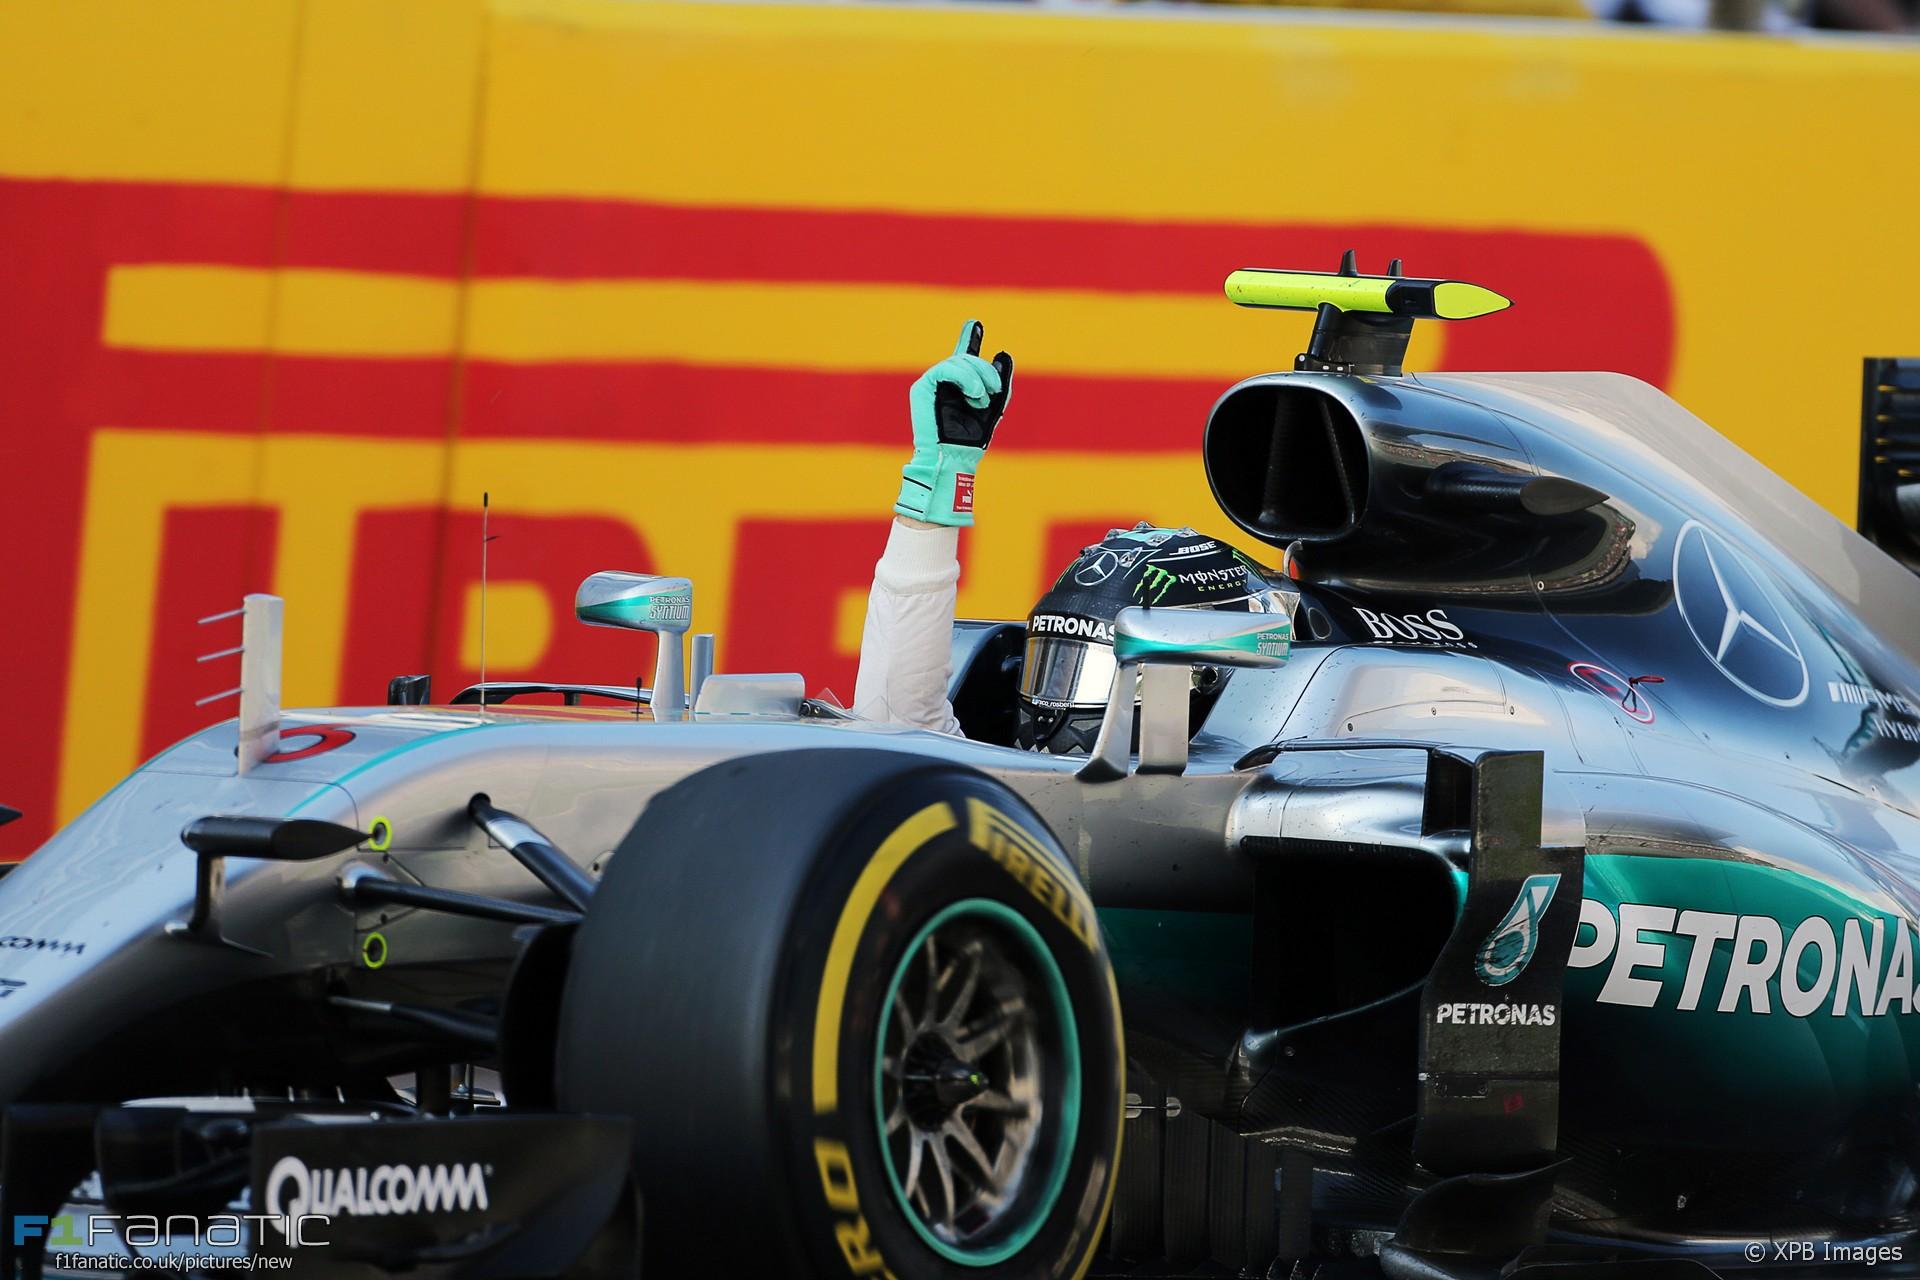 Nico Rosberg, Mercedes, Sochi Autodrom, 2016